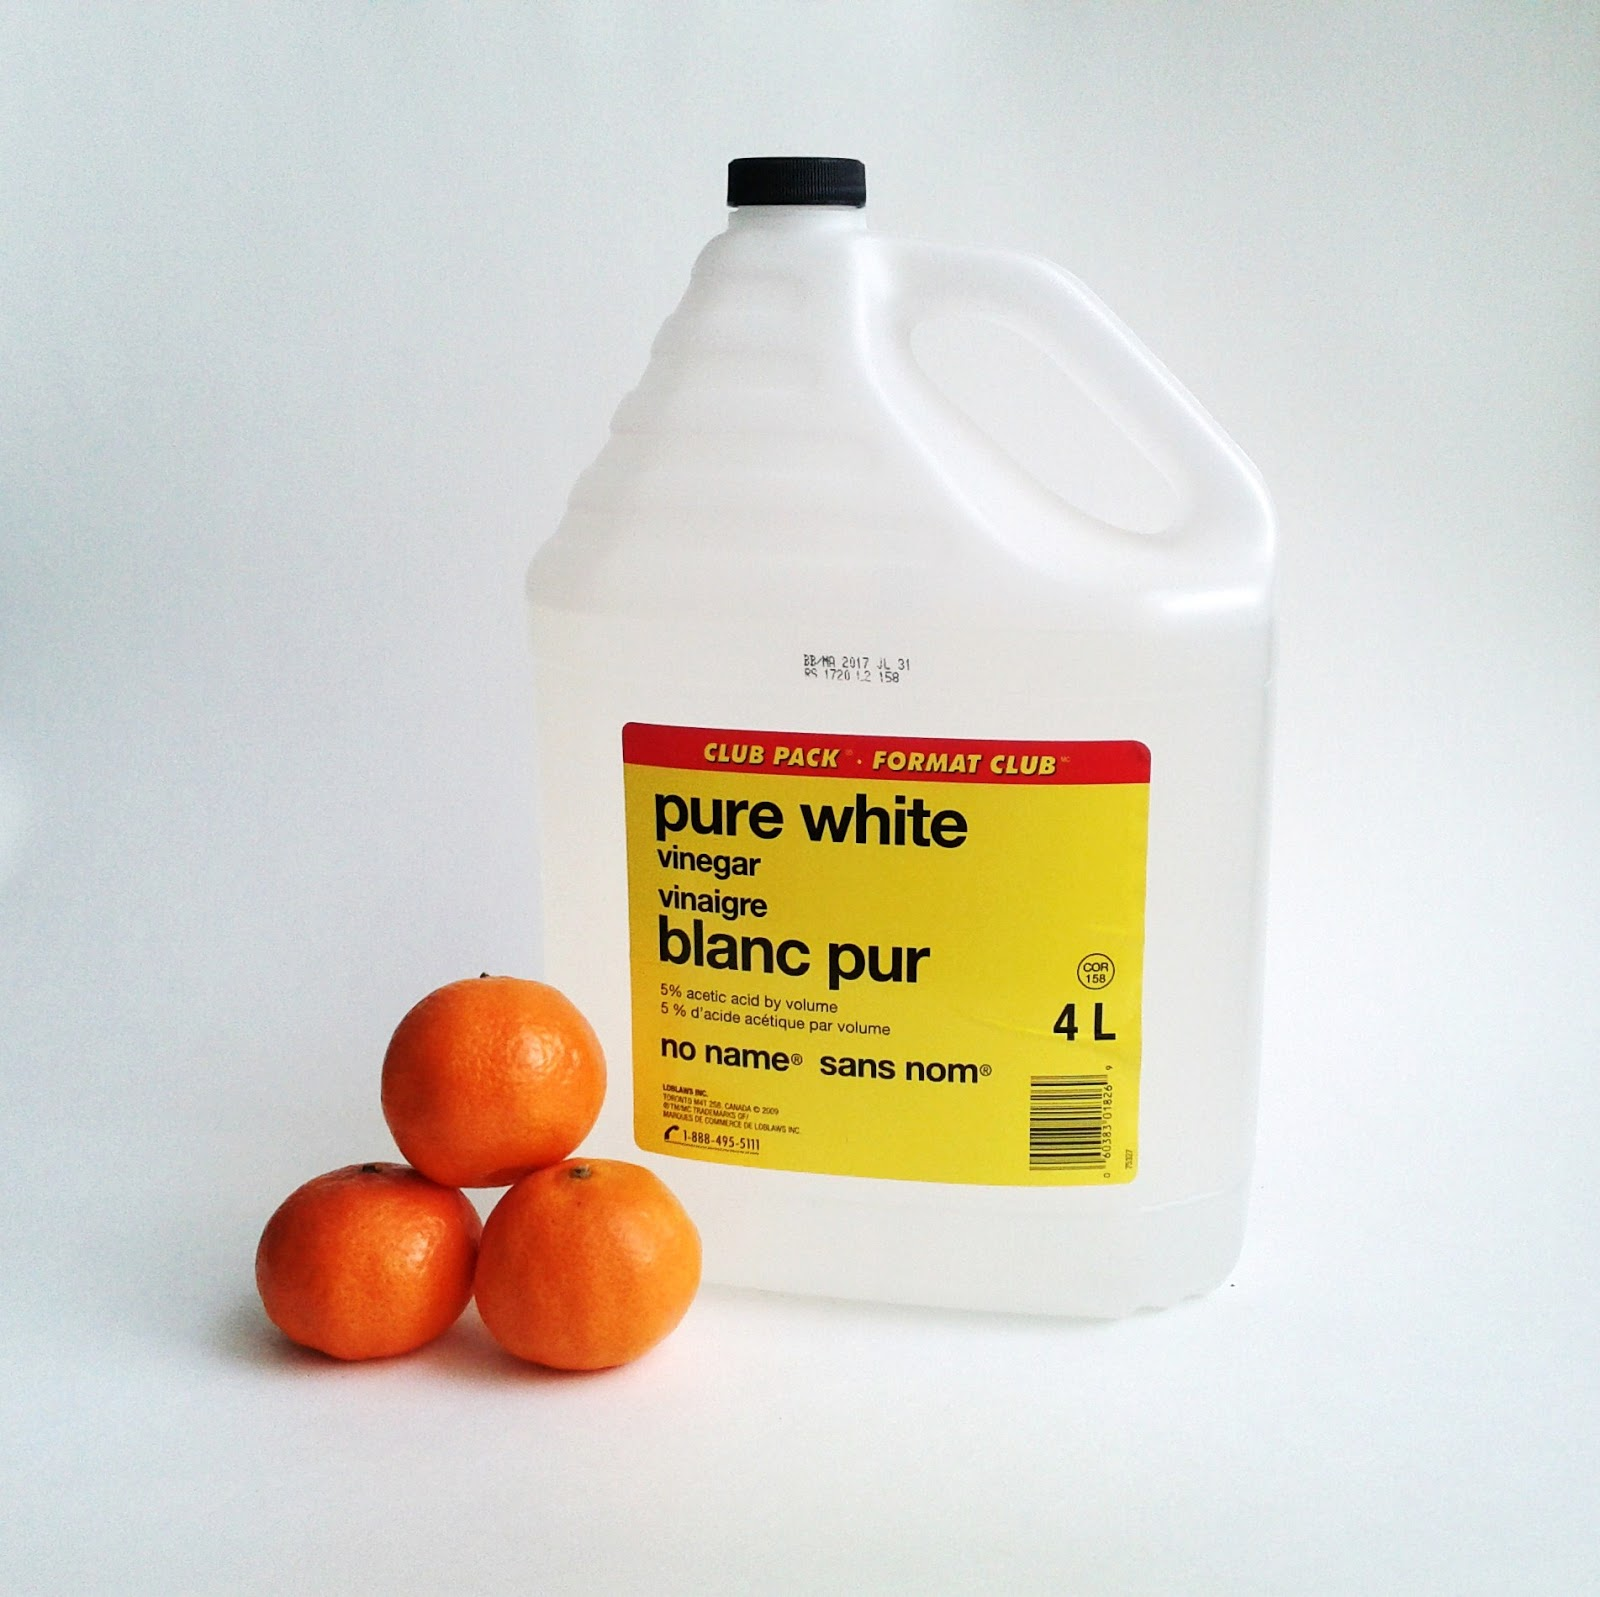 Vinegar As Degreaser: L'Heure Bleue At Home: Homemade Citrus And Vinegar Cleaner